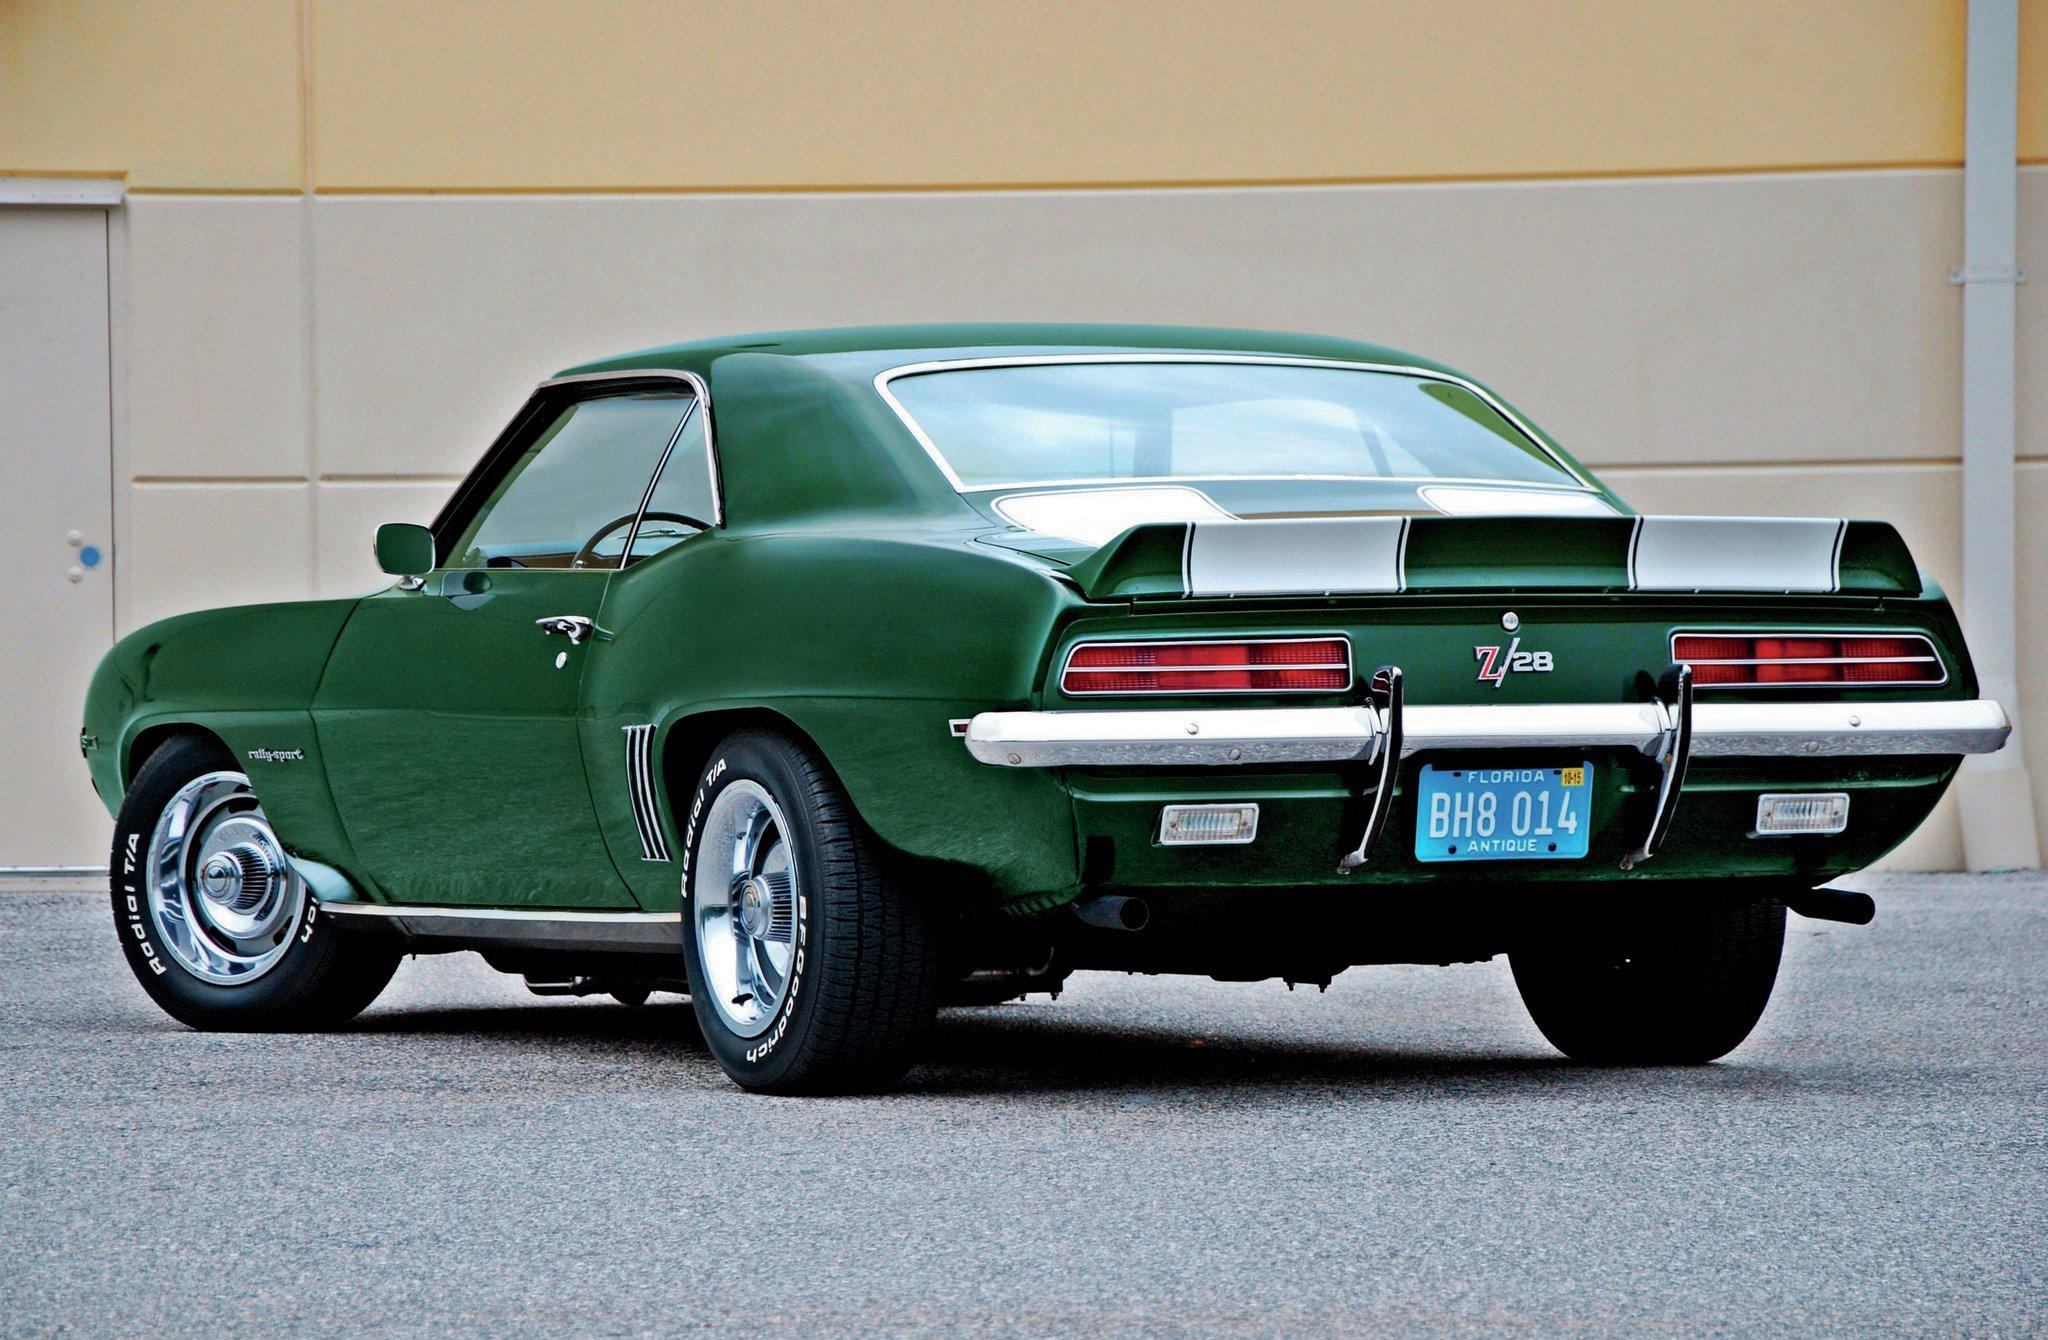 1969 Chevrolet Camaro Z28 - Z-Lite - Hot Rod Network